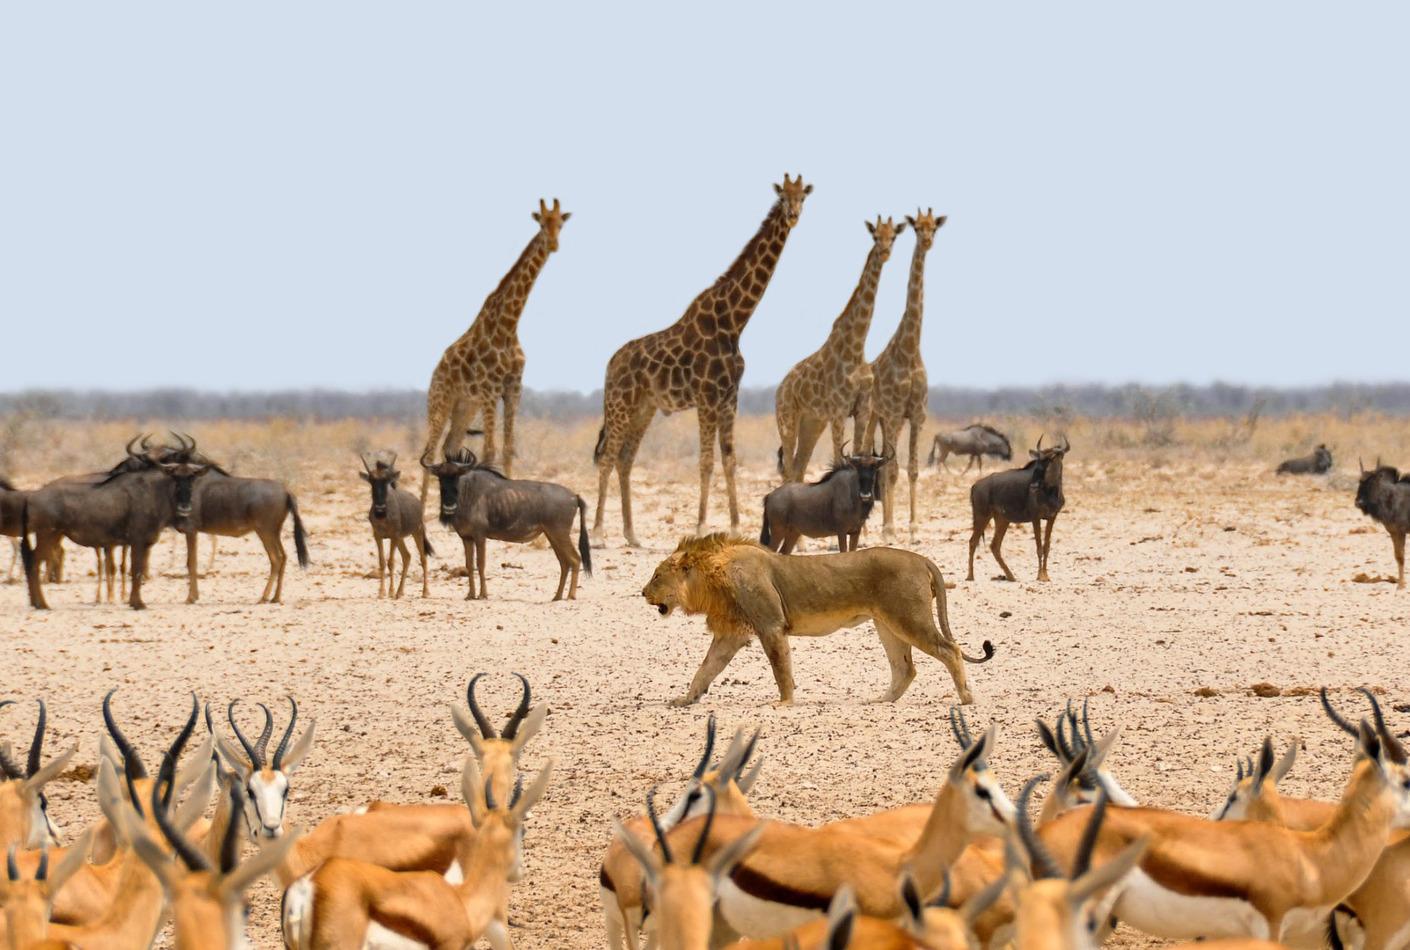 Animales salvajes en Namibia, África